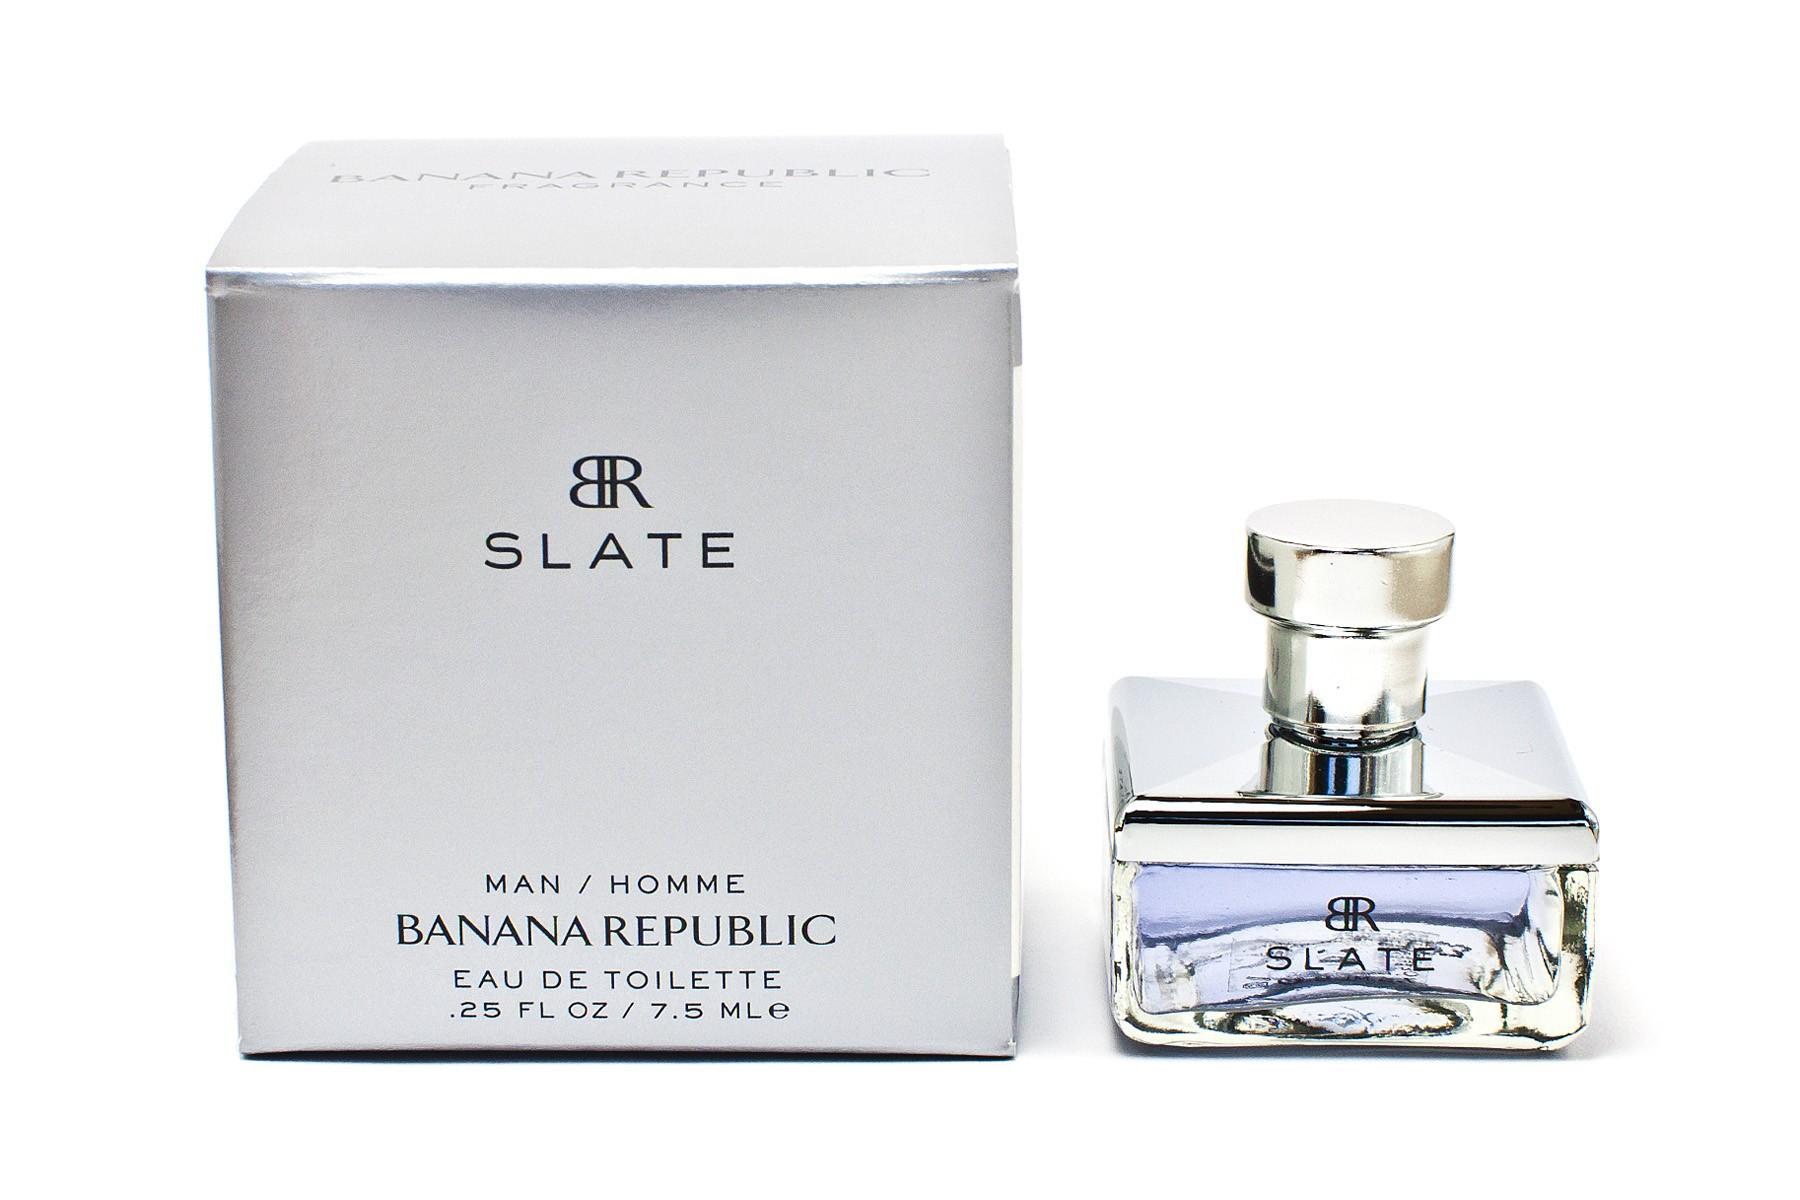 Banana Republic Slate аромат для мужчин